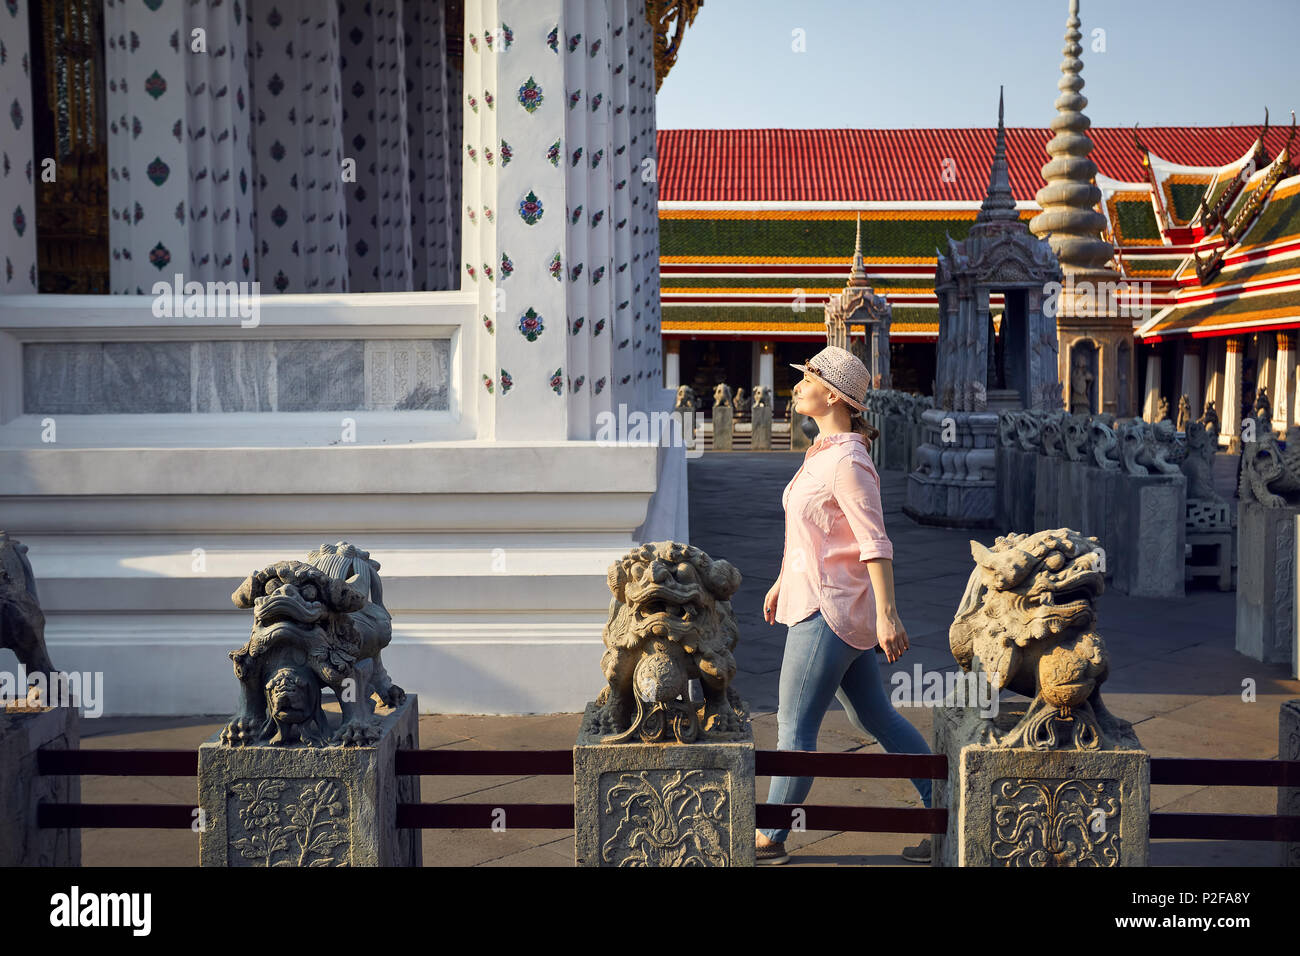 Beautiful tourist woman in hat and pink shirt walking in Wat Arun temple at sunset in Bangkok, Thailand - Stock Image